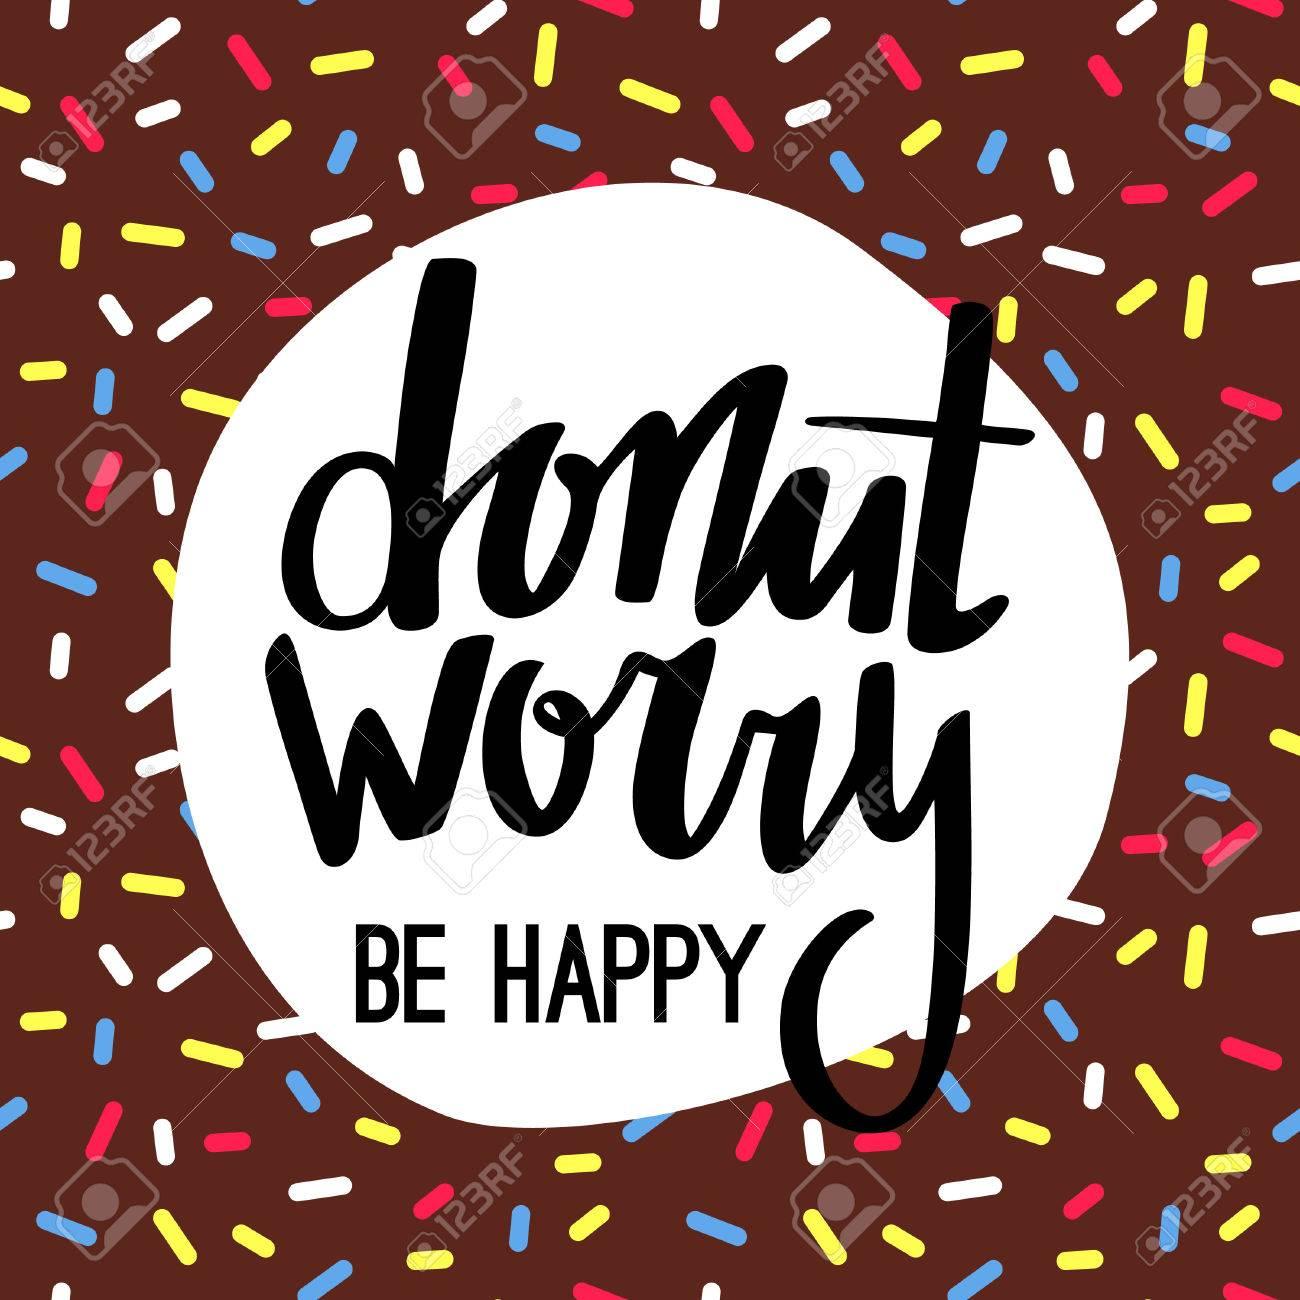 Donut worry be happy funny greeting card lettered phrase on donut worry be happy funny greeting card lettered phrase on brown chocolate doughnut glaze m4hsunfo